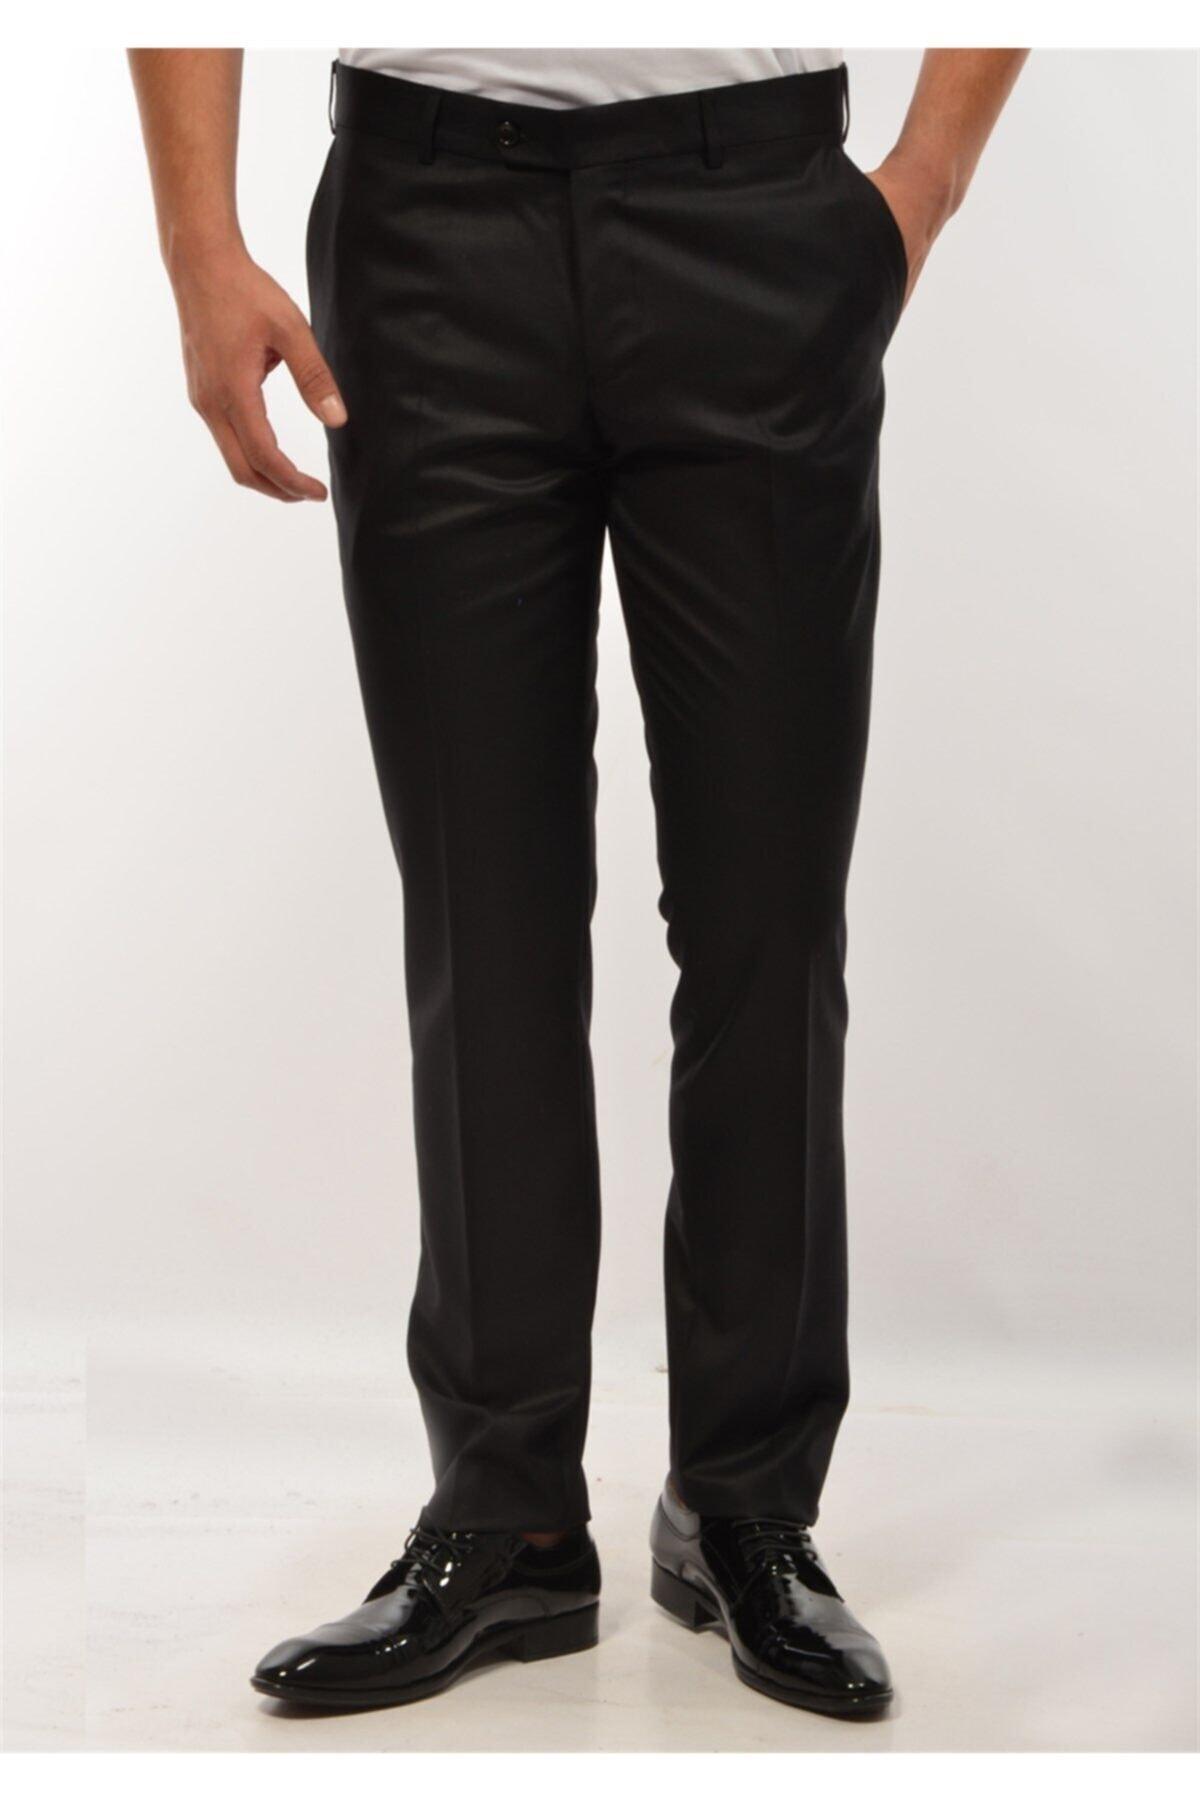 ModaPlaza Erkek Pantolon Siyah Kumaş 1